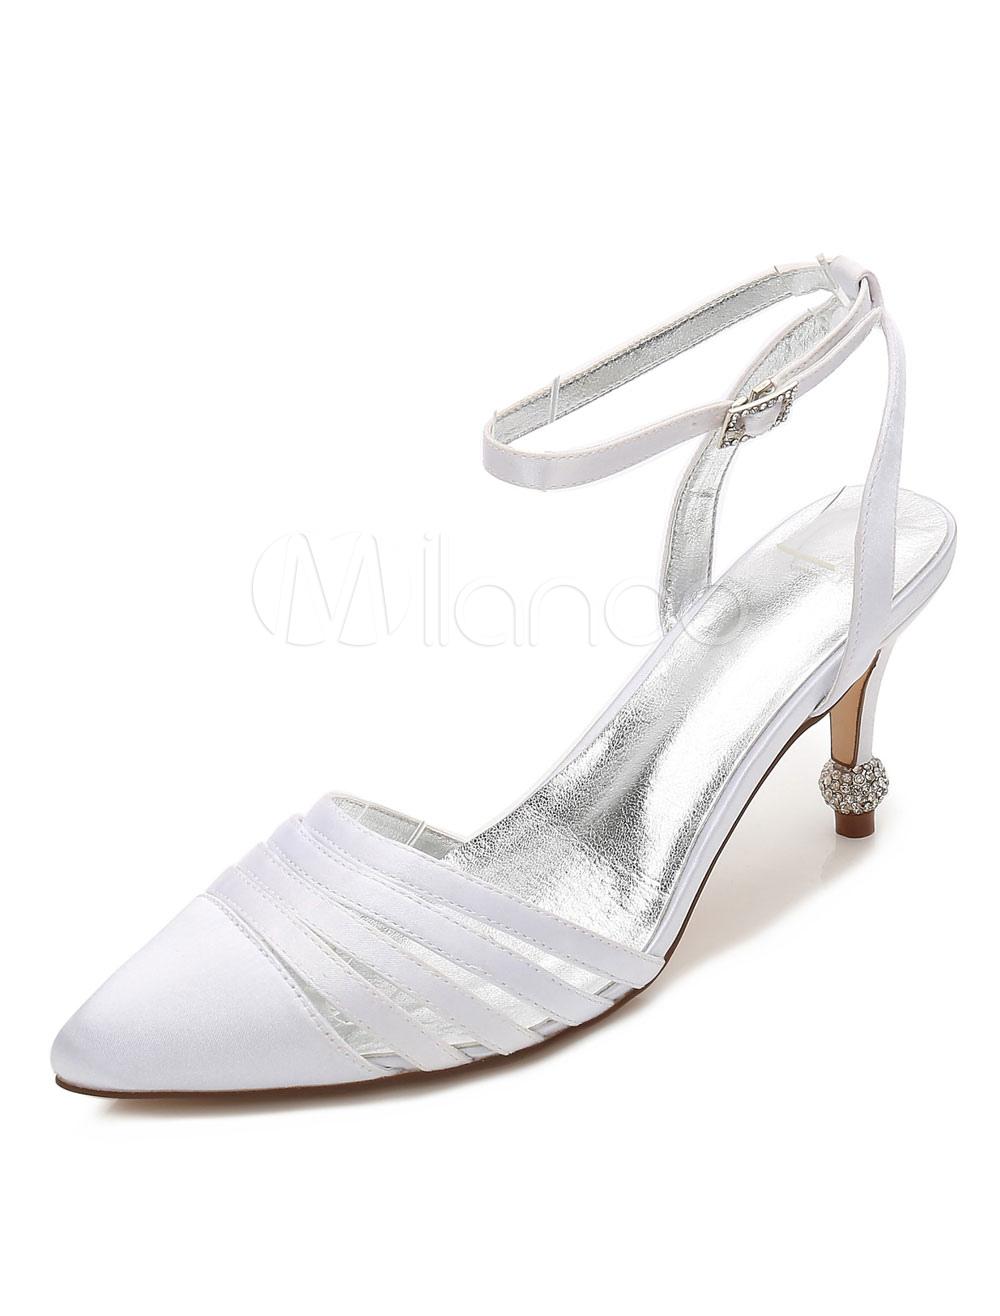 Ivory Wedding Shoes Satin Pointed Toe Rhinestones Ankle Strap Bridal Shoes